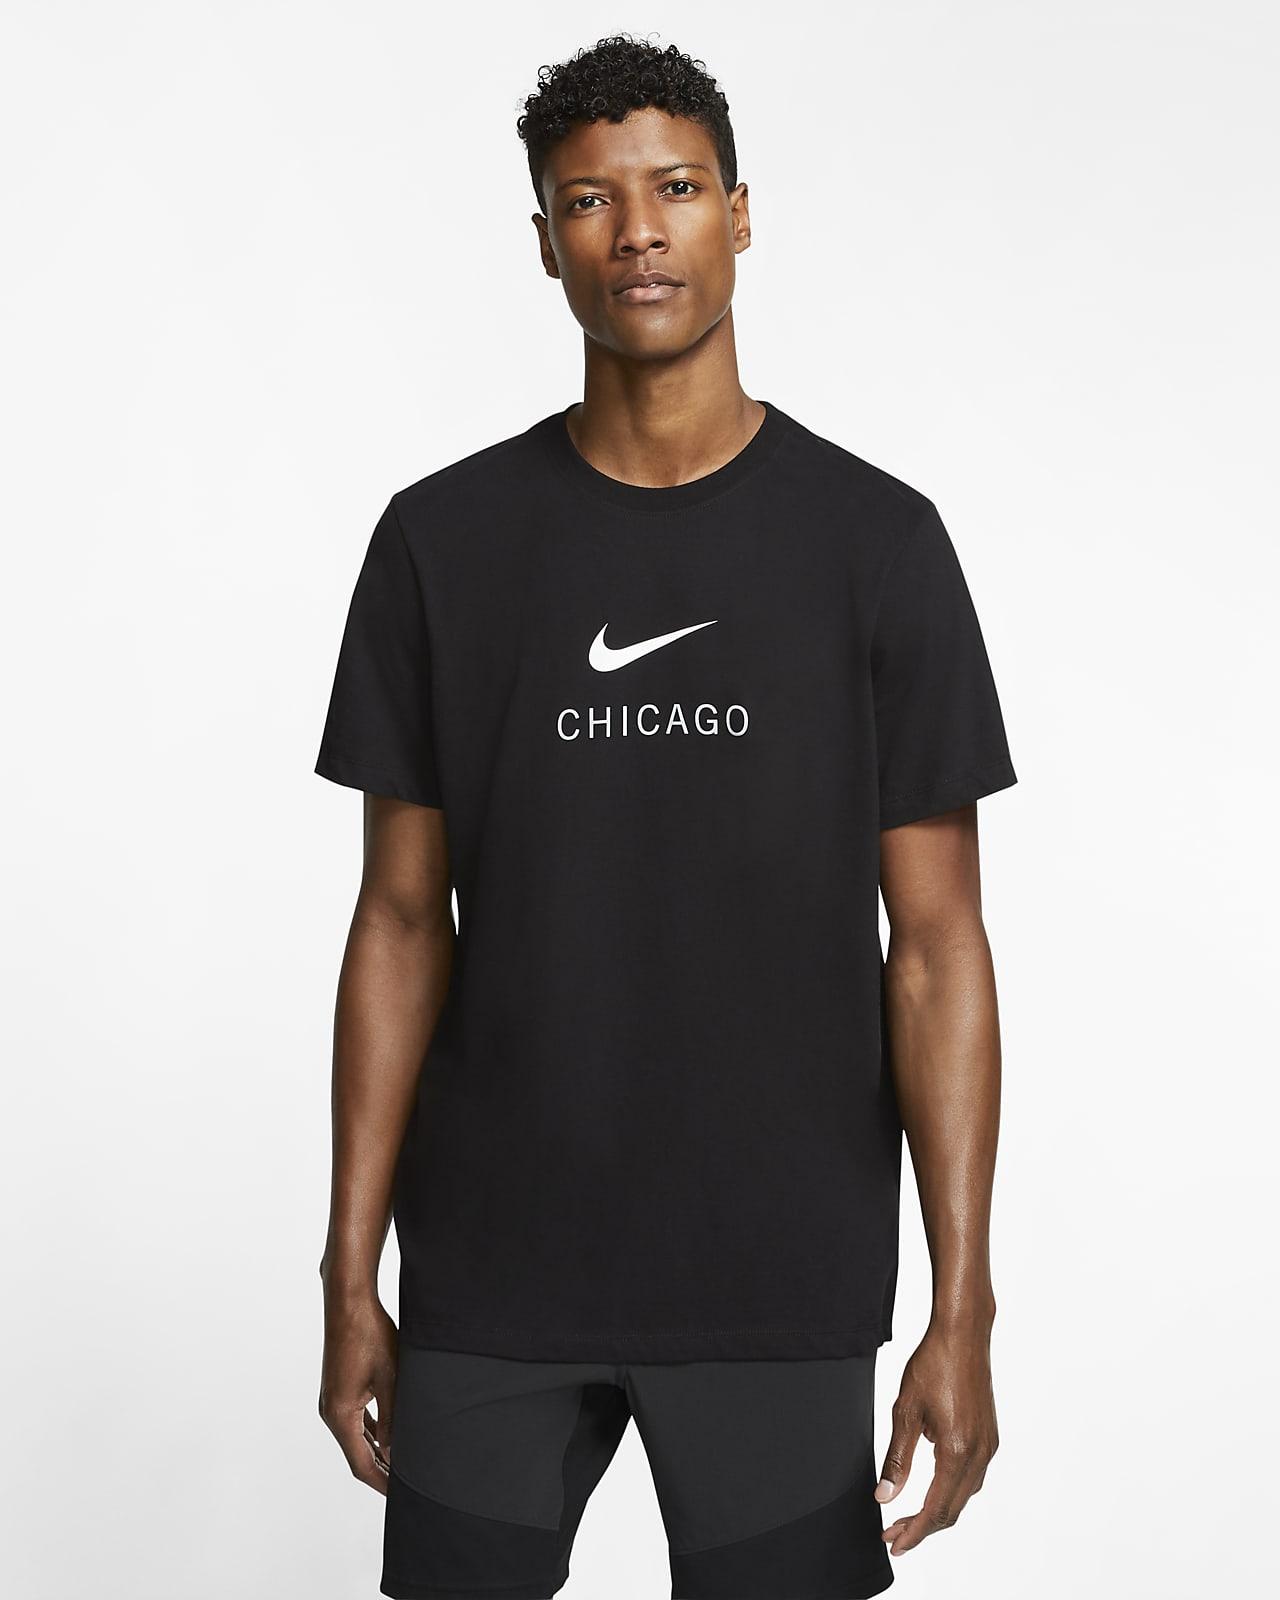 Nike Dri-FIT Chicago Men's Training T-Shirt